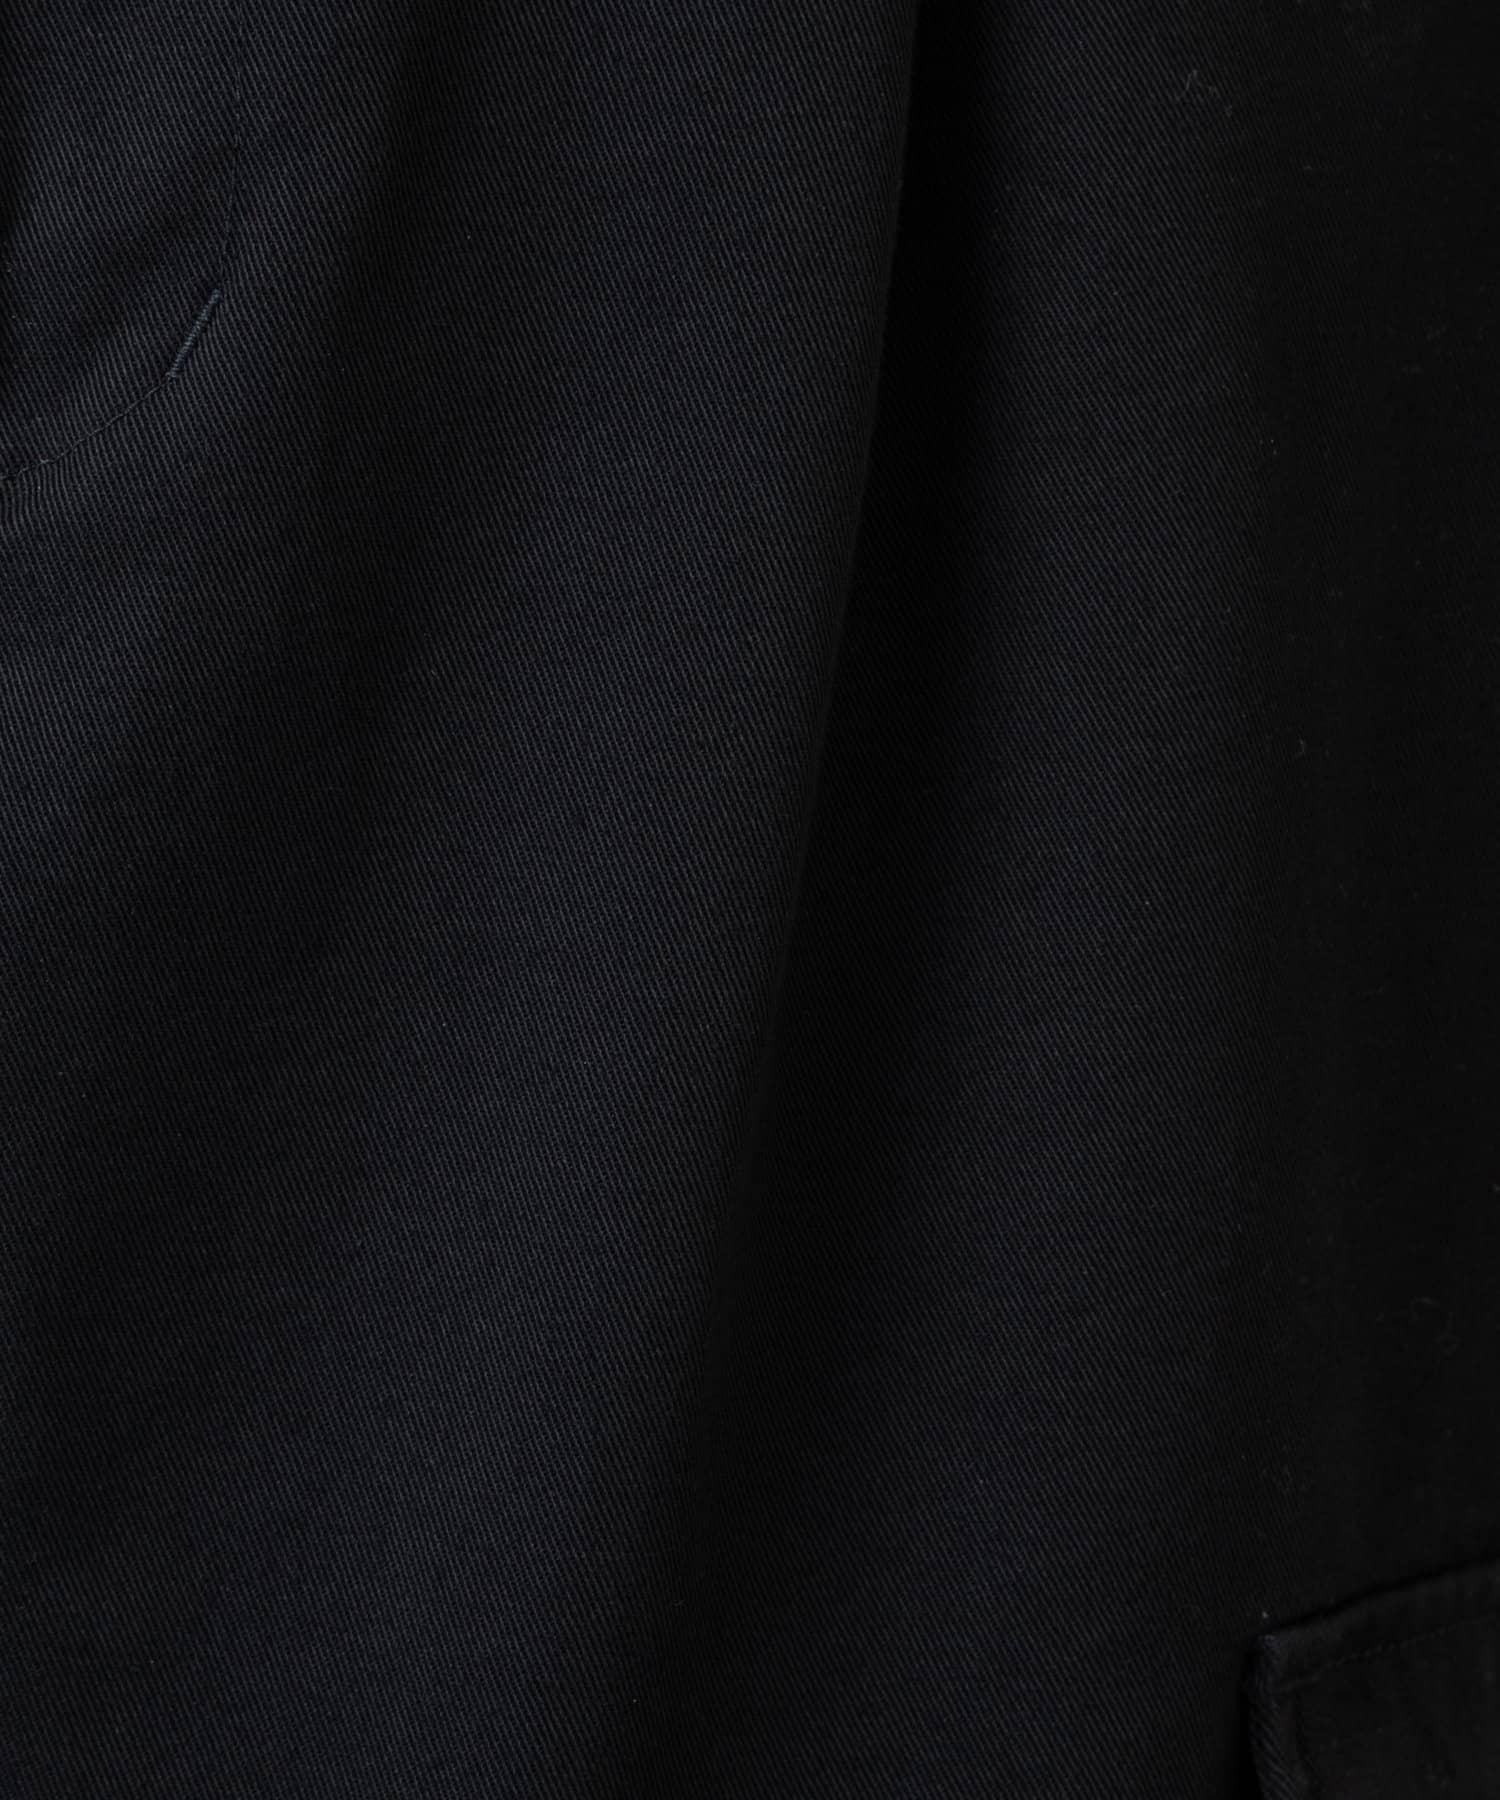 GALLARDAGALANTE(ガリャルダガランテ) サスペンダー付きカーゴパンツ